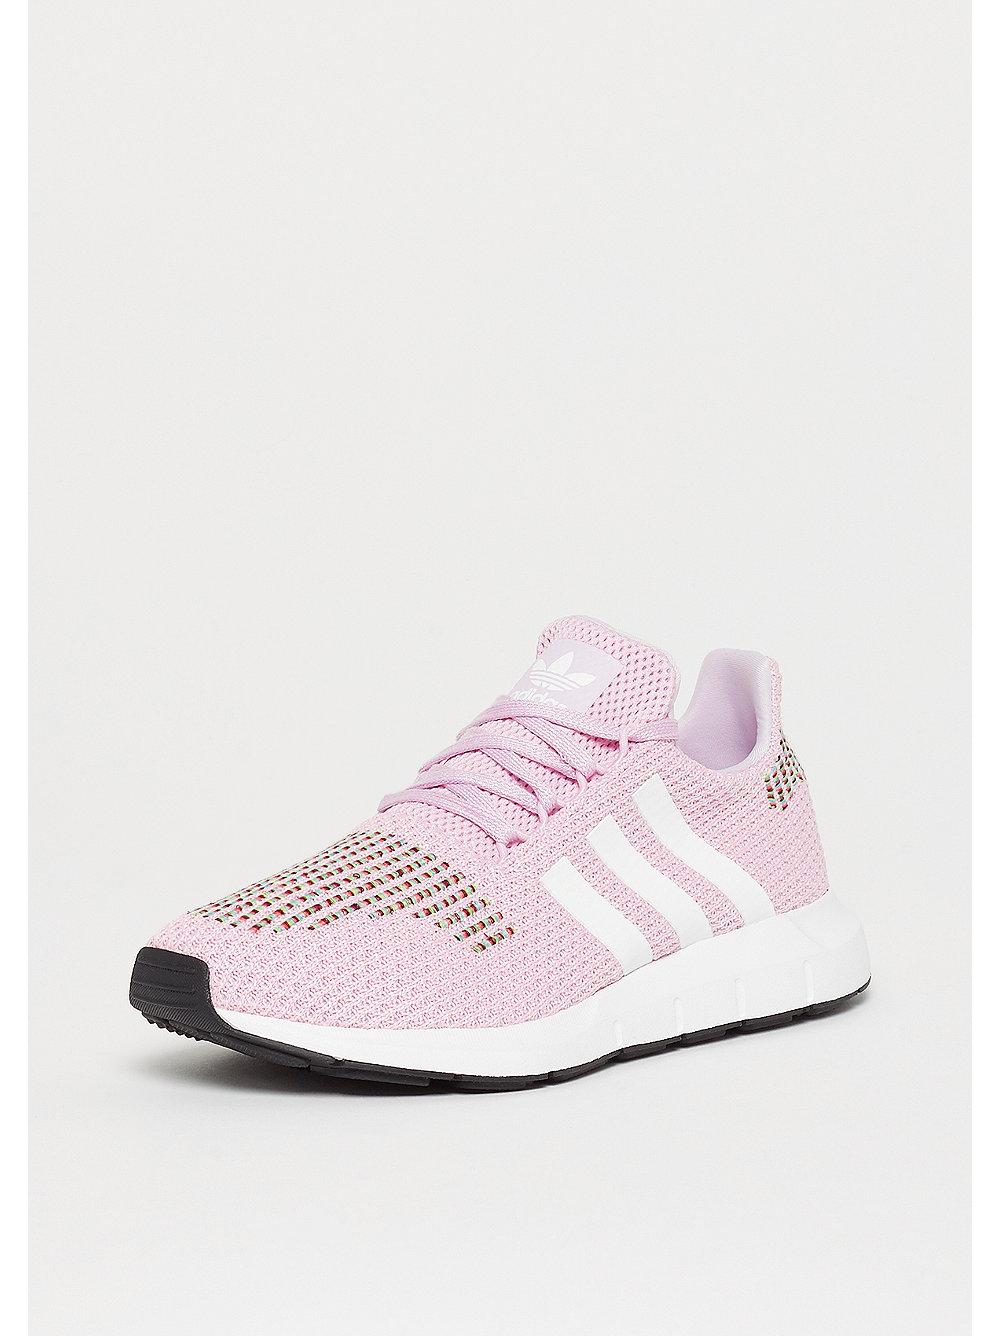 Calzado adidas white aero Swift ftwr Run W pink qxz7t4